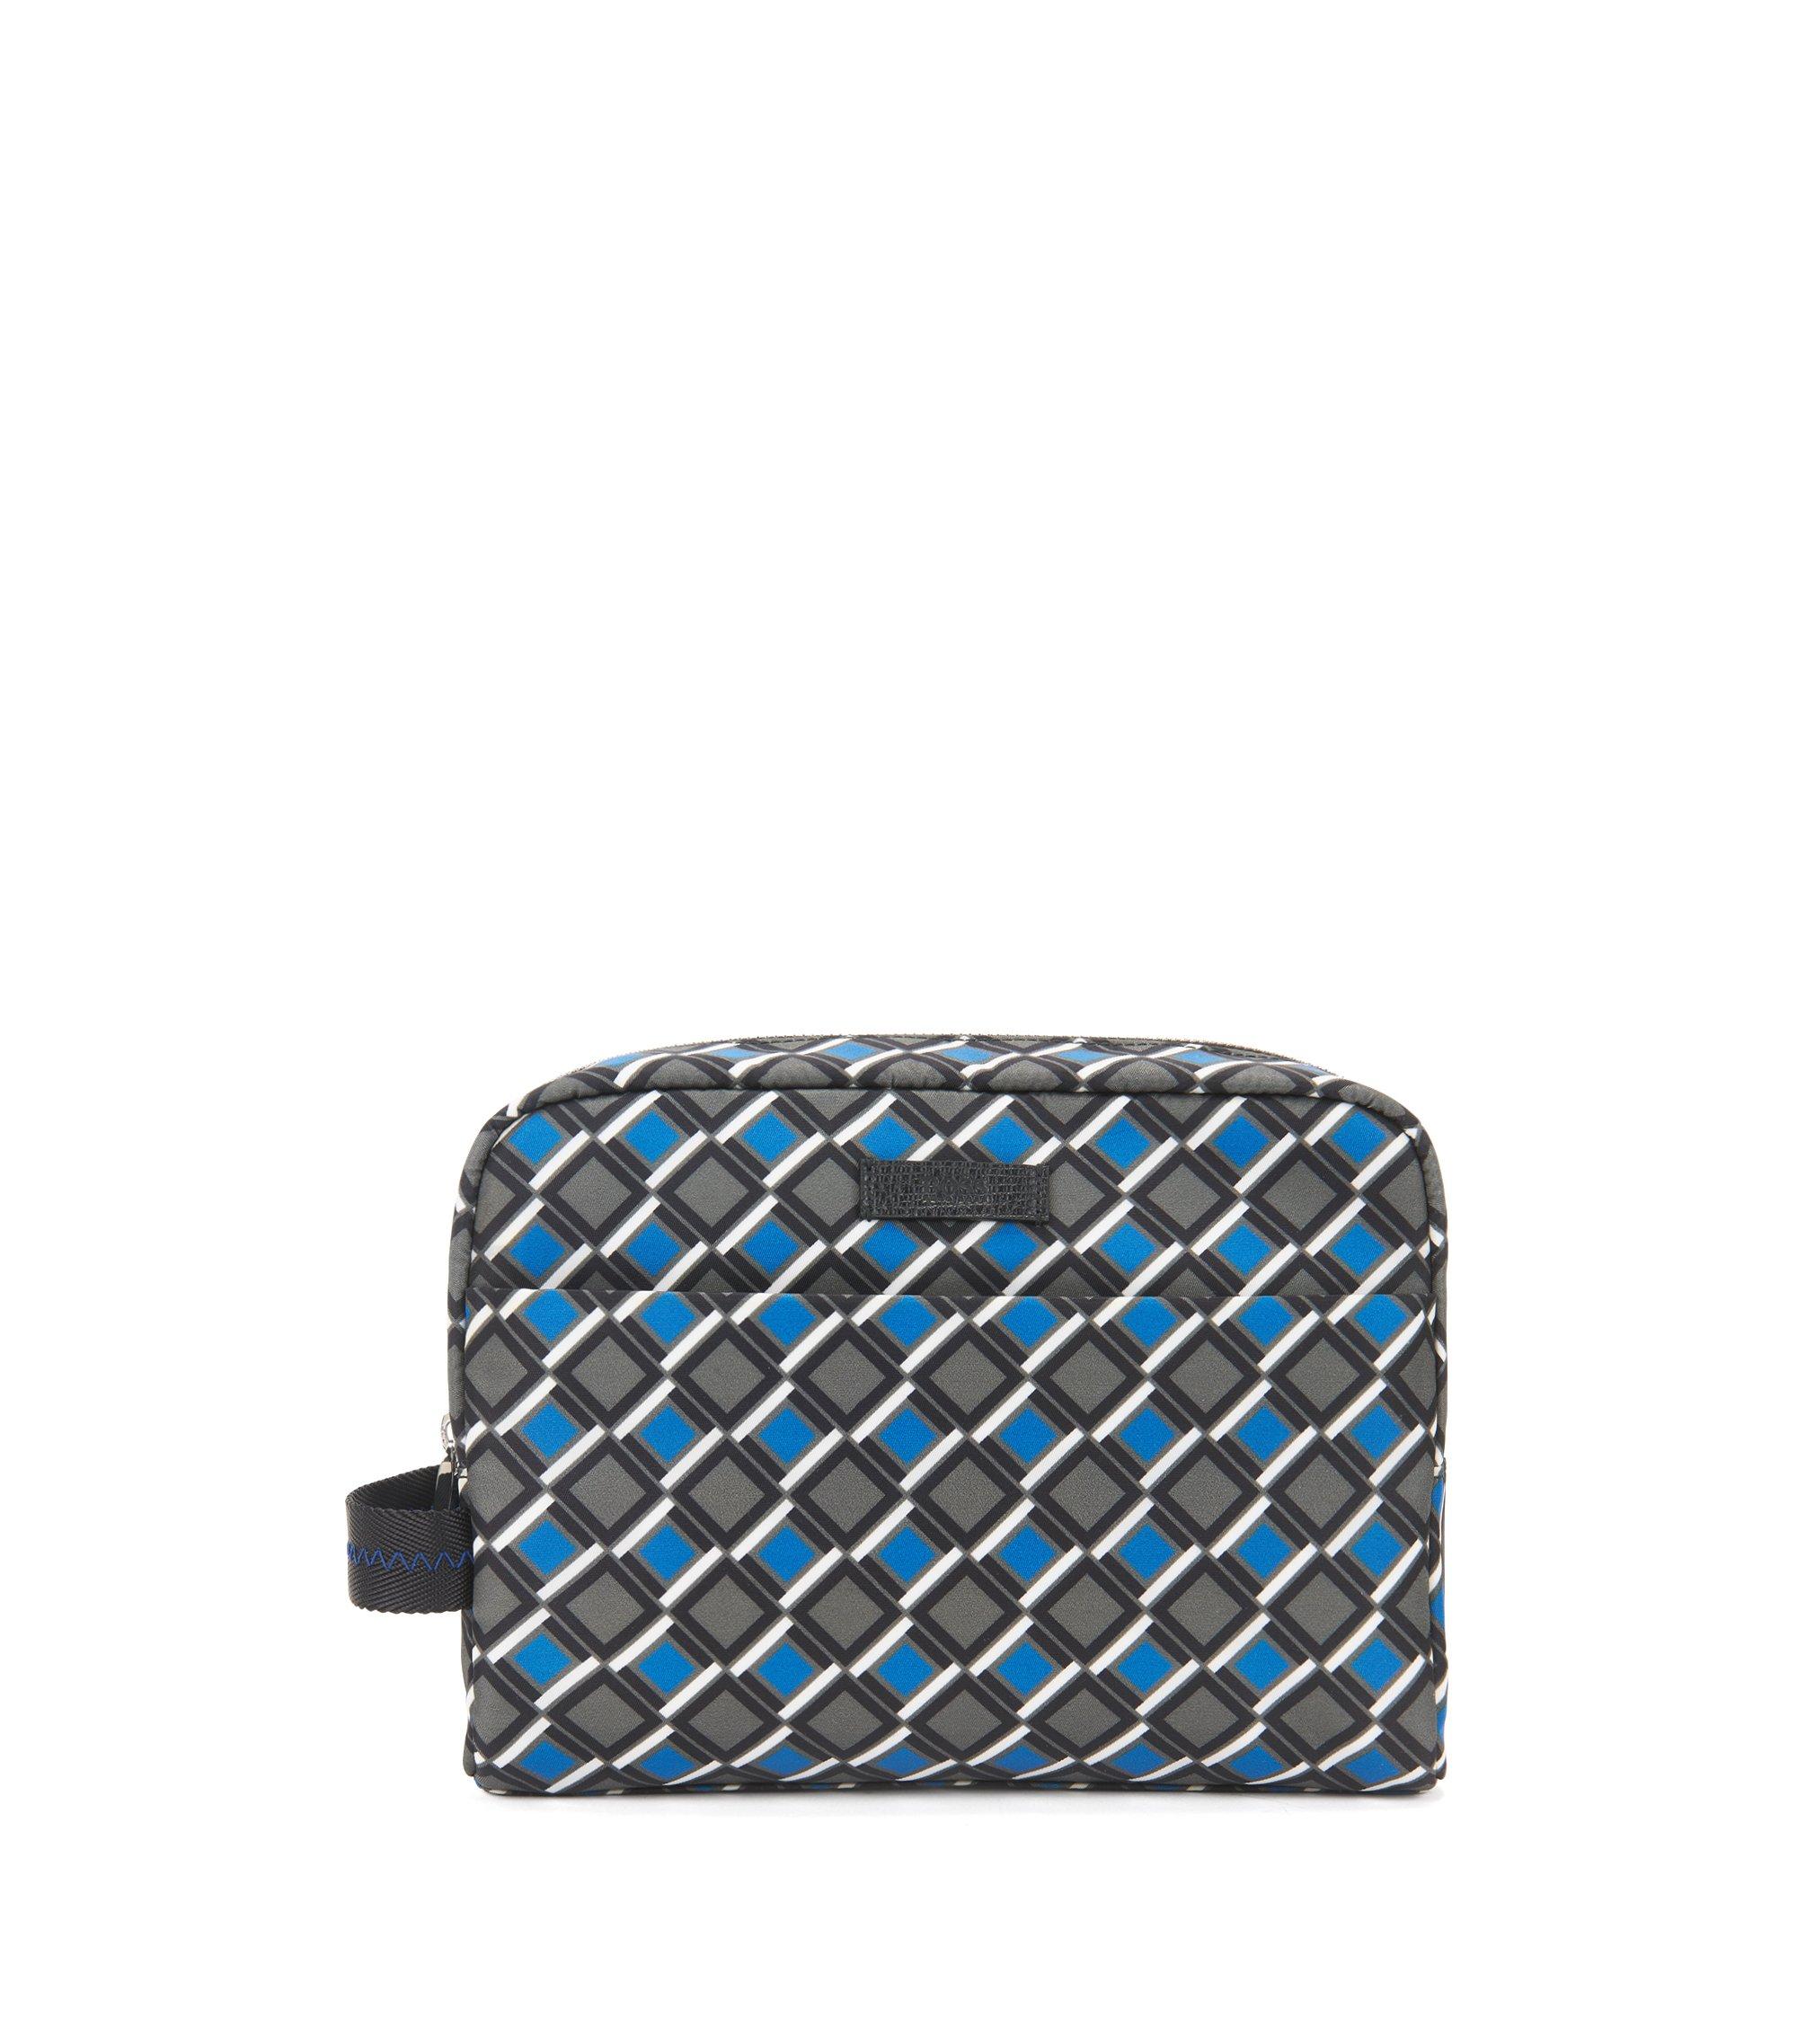 Washbag in gabardine nylon with geometric print, Patterned